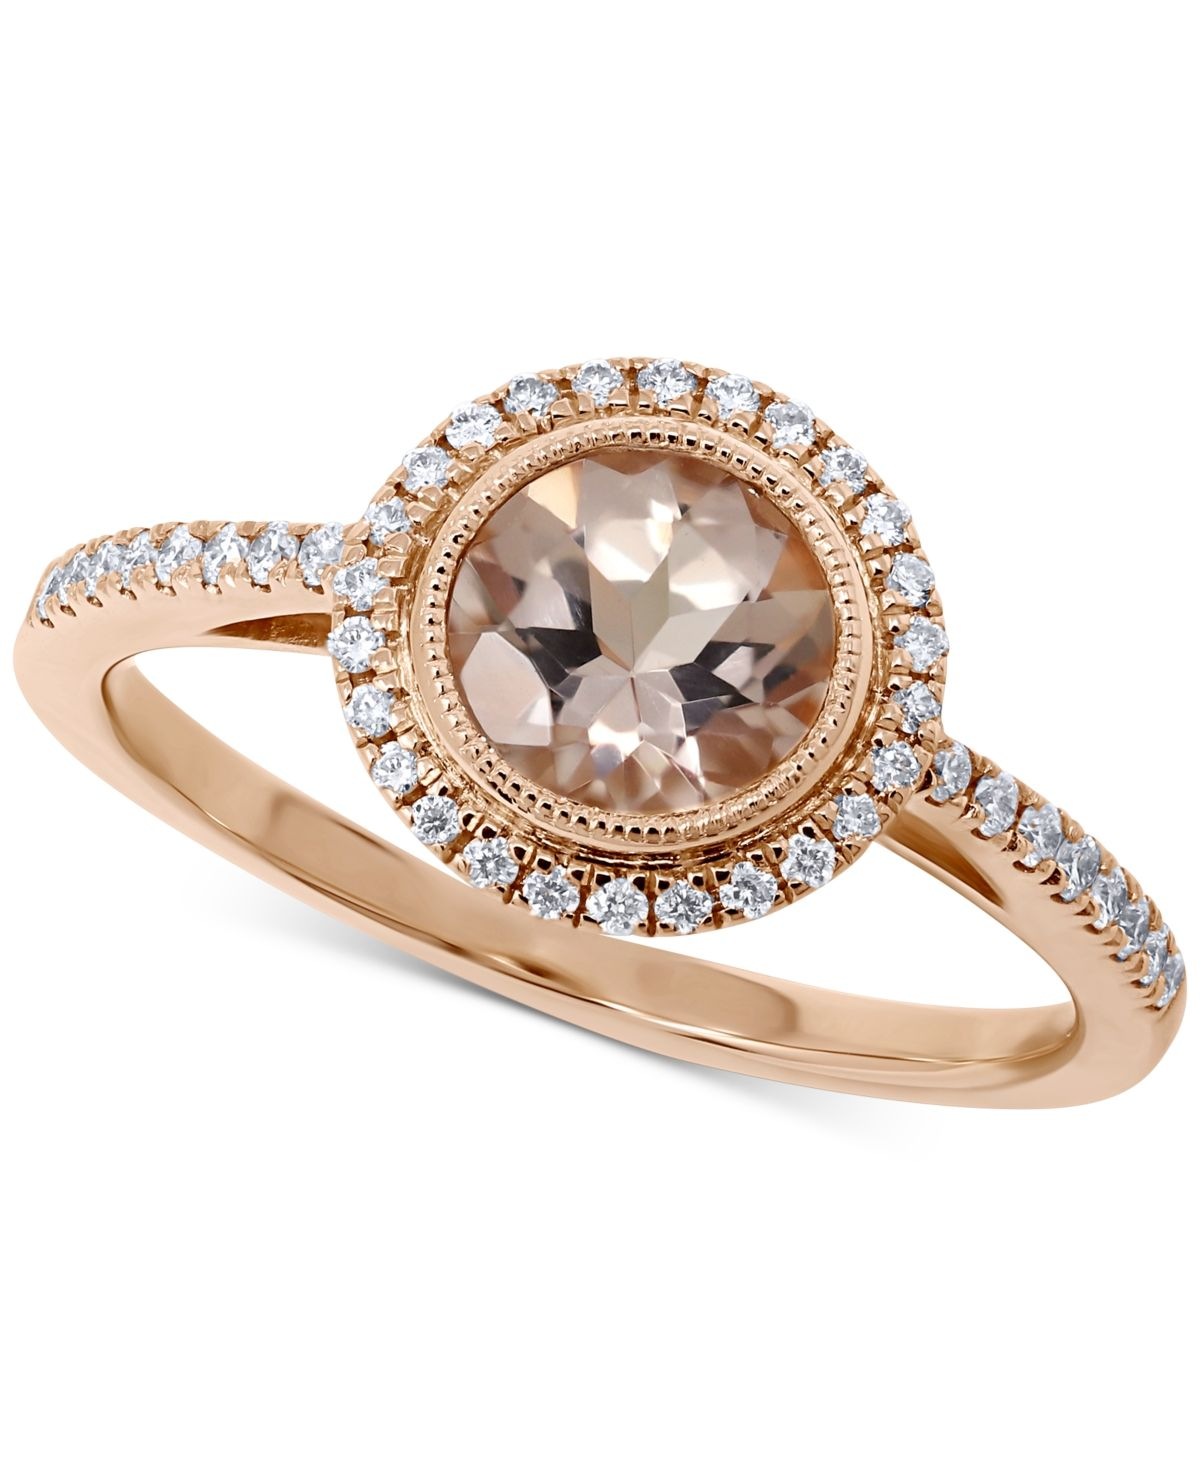 Morganite 7 8 Ct T W Diamond 1 5 Ct T W Halo Ring In 14k